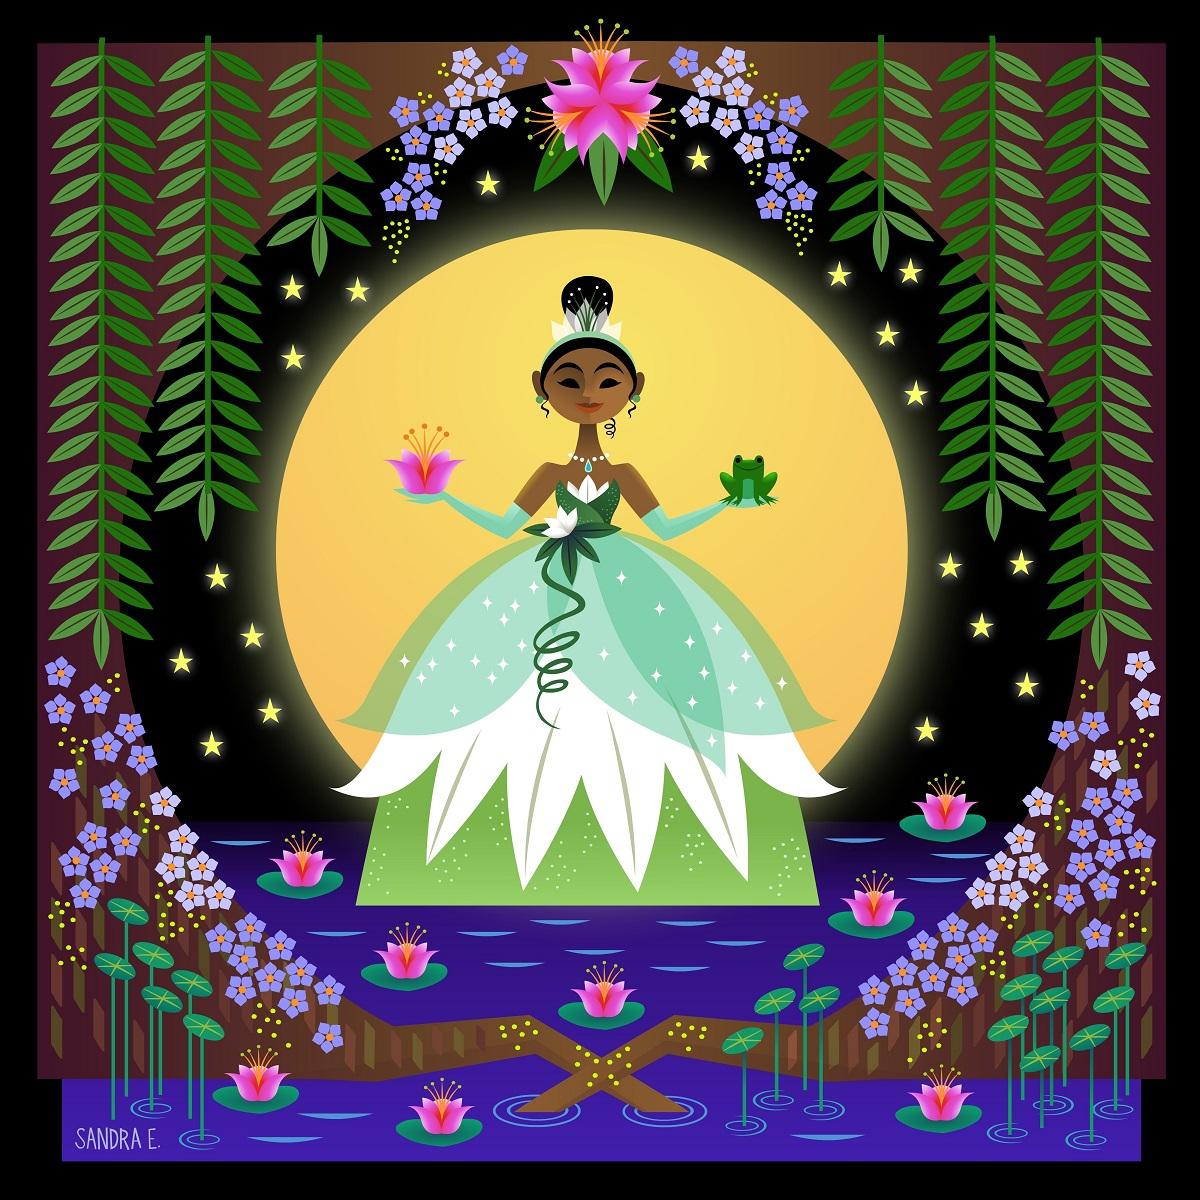 Princess-Tiana-by-Sandra-Equihua.jpg